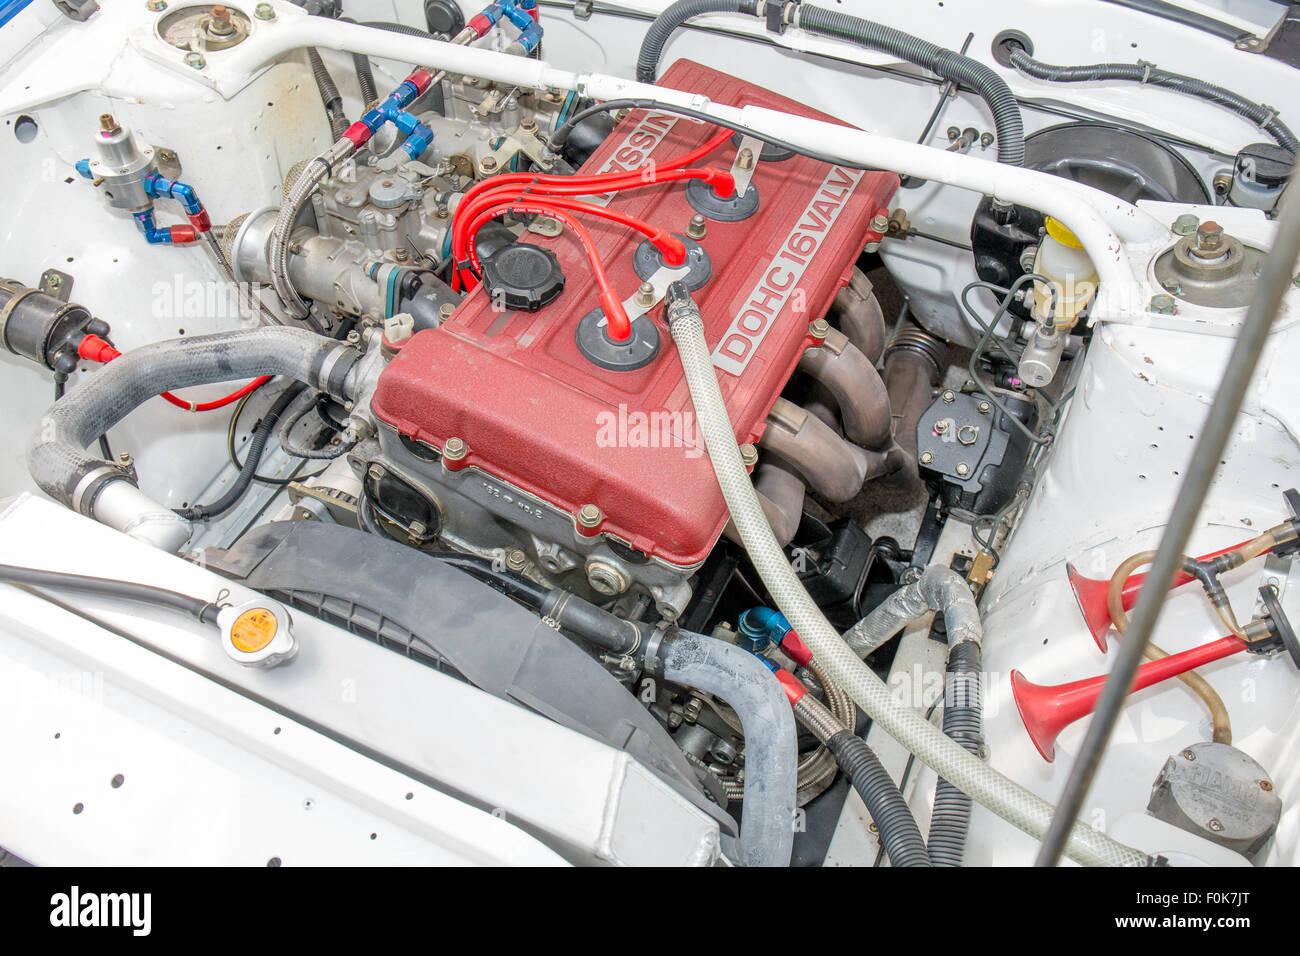 Nissan FJ24 Motor auf 240 RS 1 2015 Motorsport Japan Stockbild